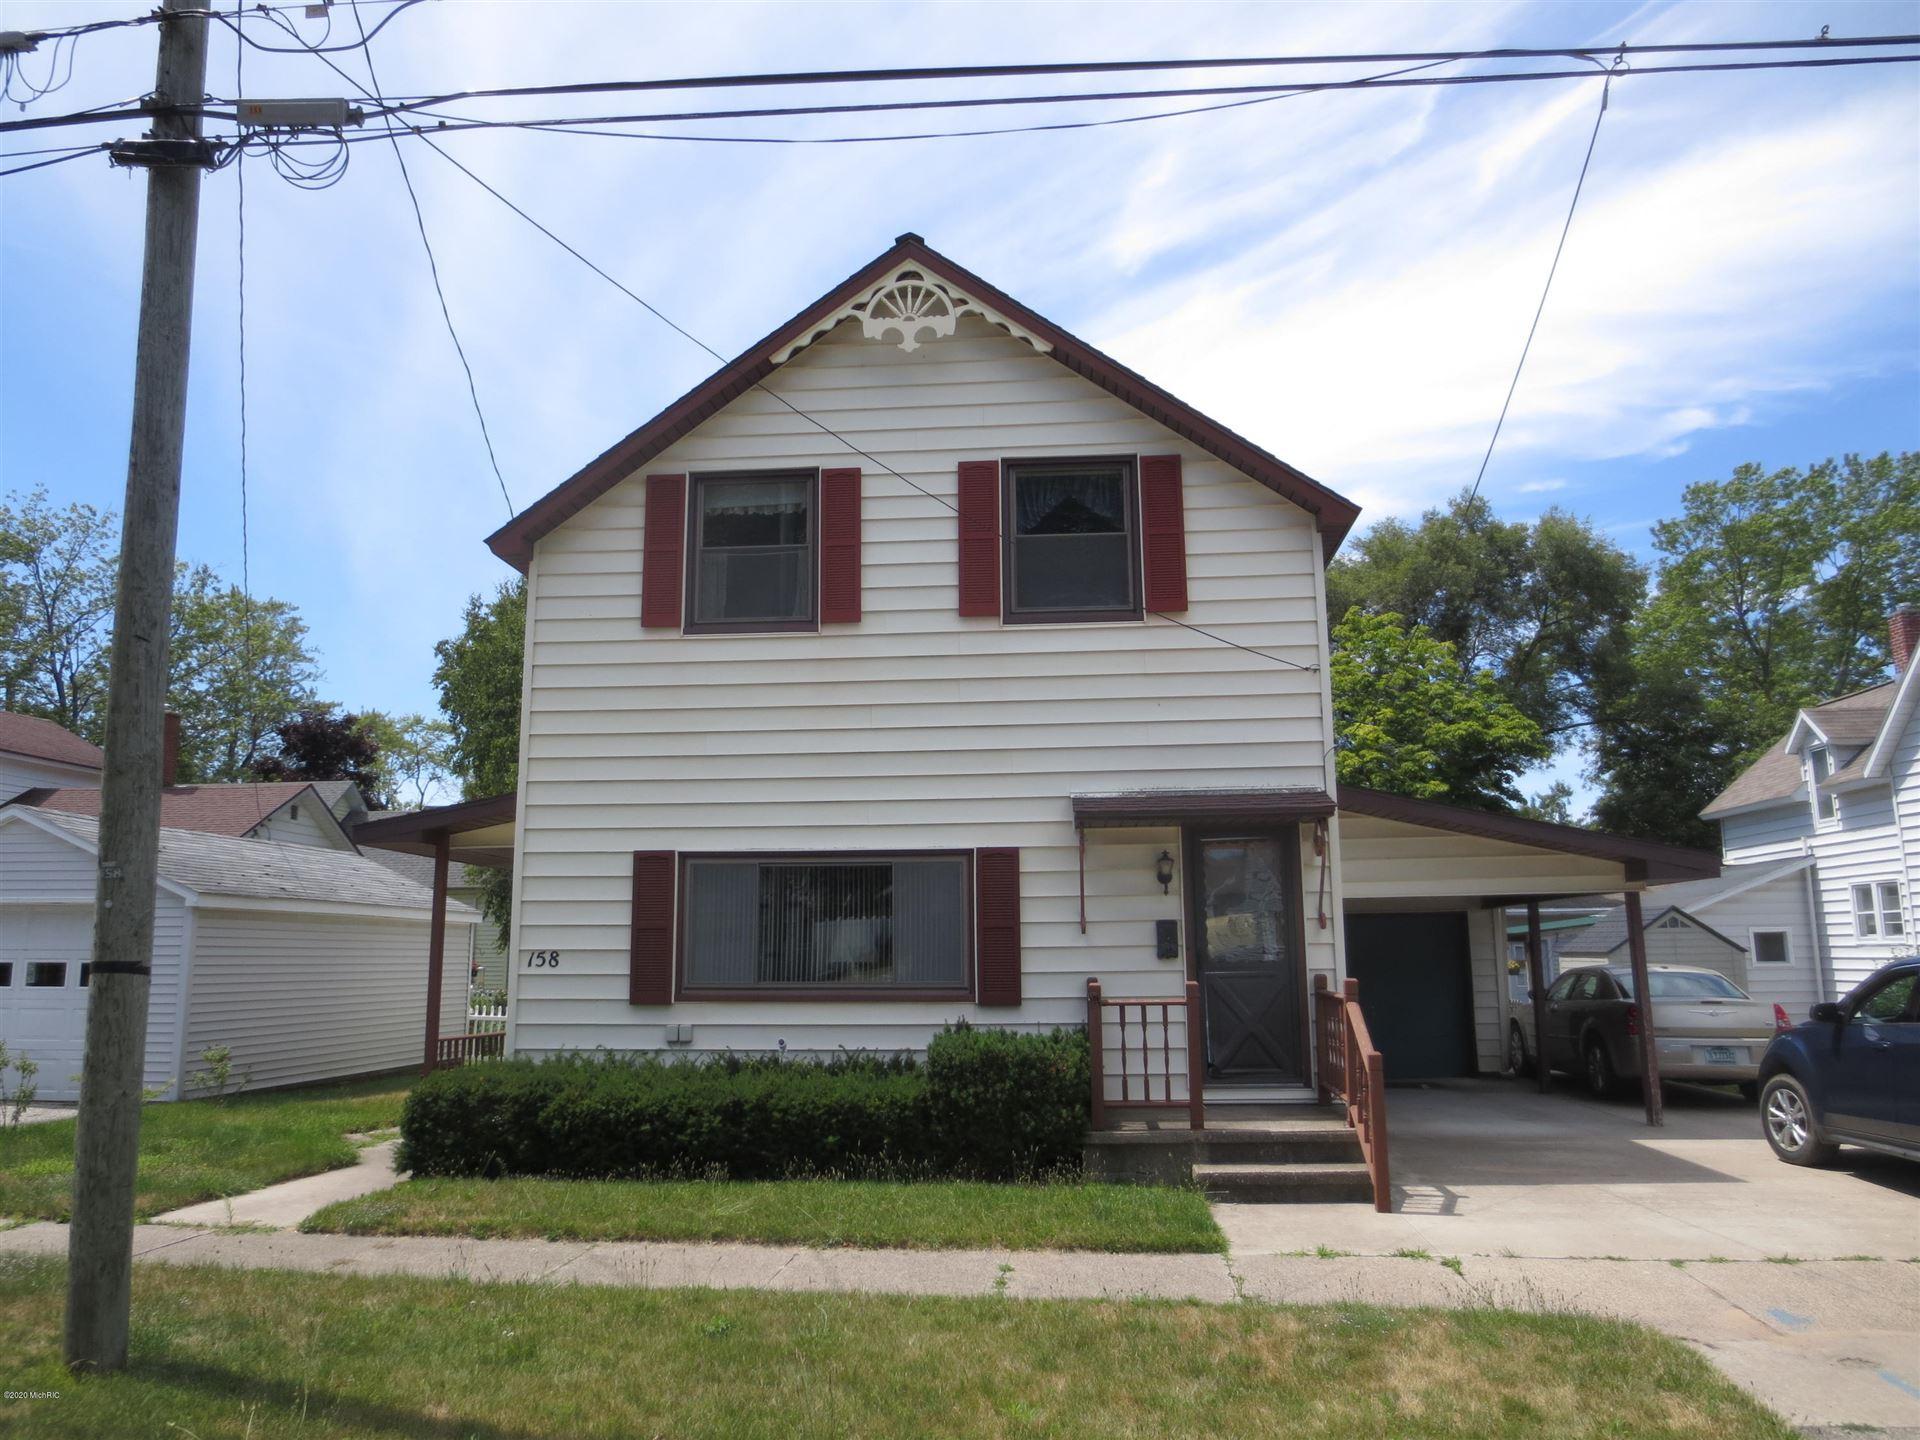 158 Ford Street, Manistee, MI 49660 - MLS#: 20029206